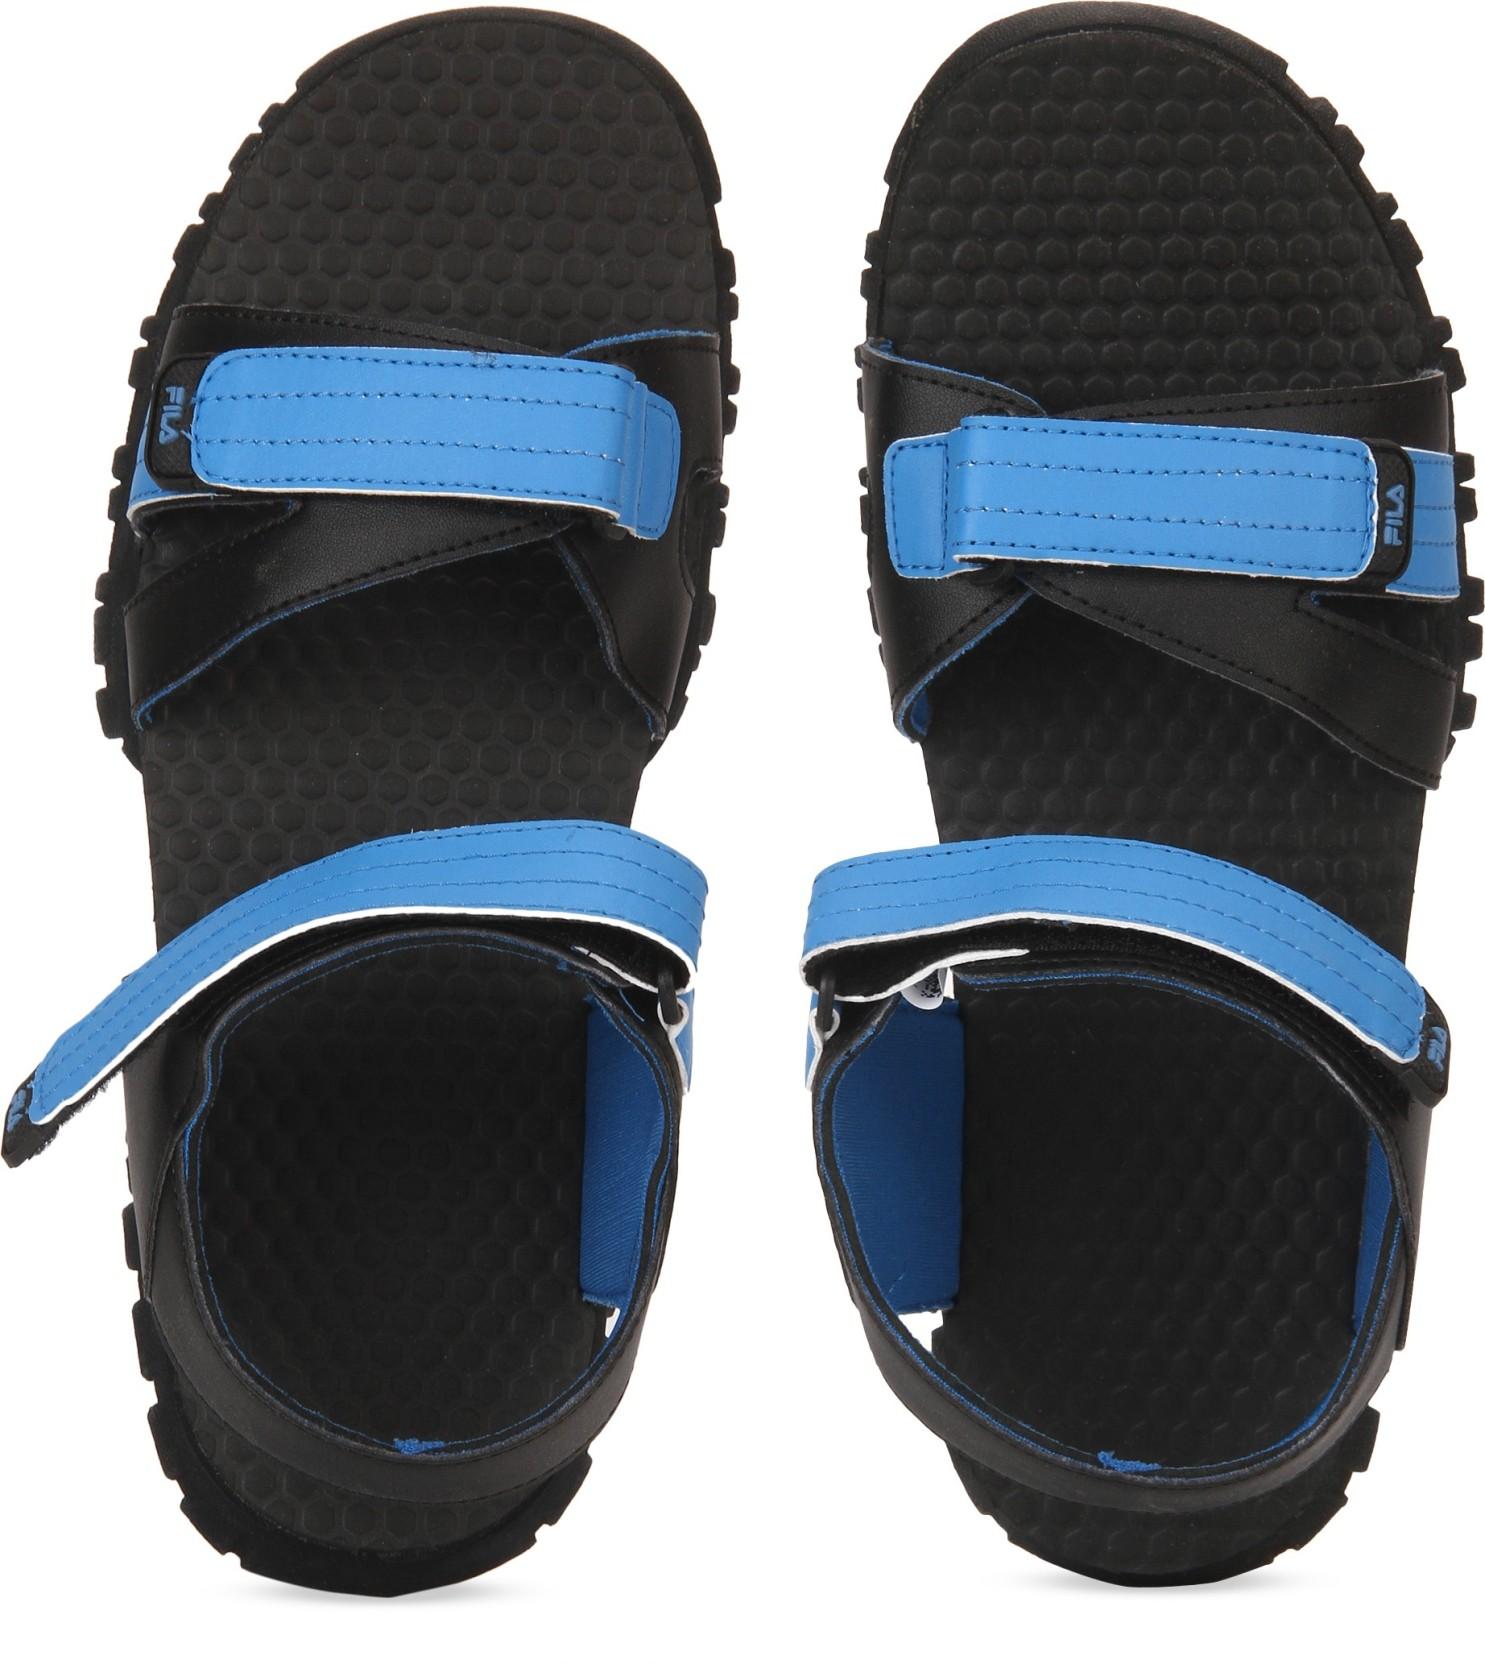 3c9307ba383e9 Fila Men BLK RYL BLU Sports Sandals - Buy Fila Men BLK RYL BLU ...